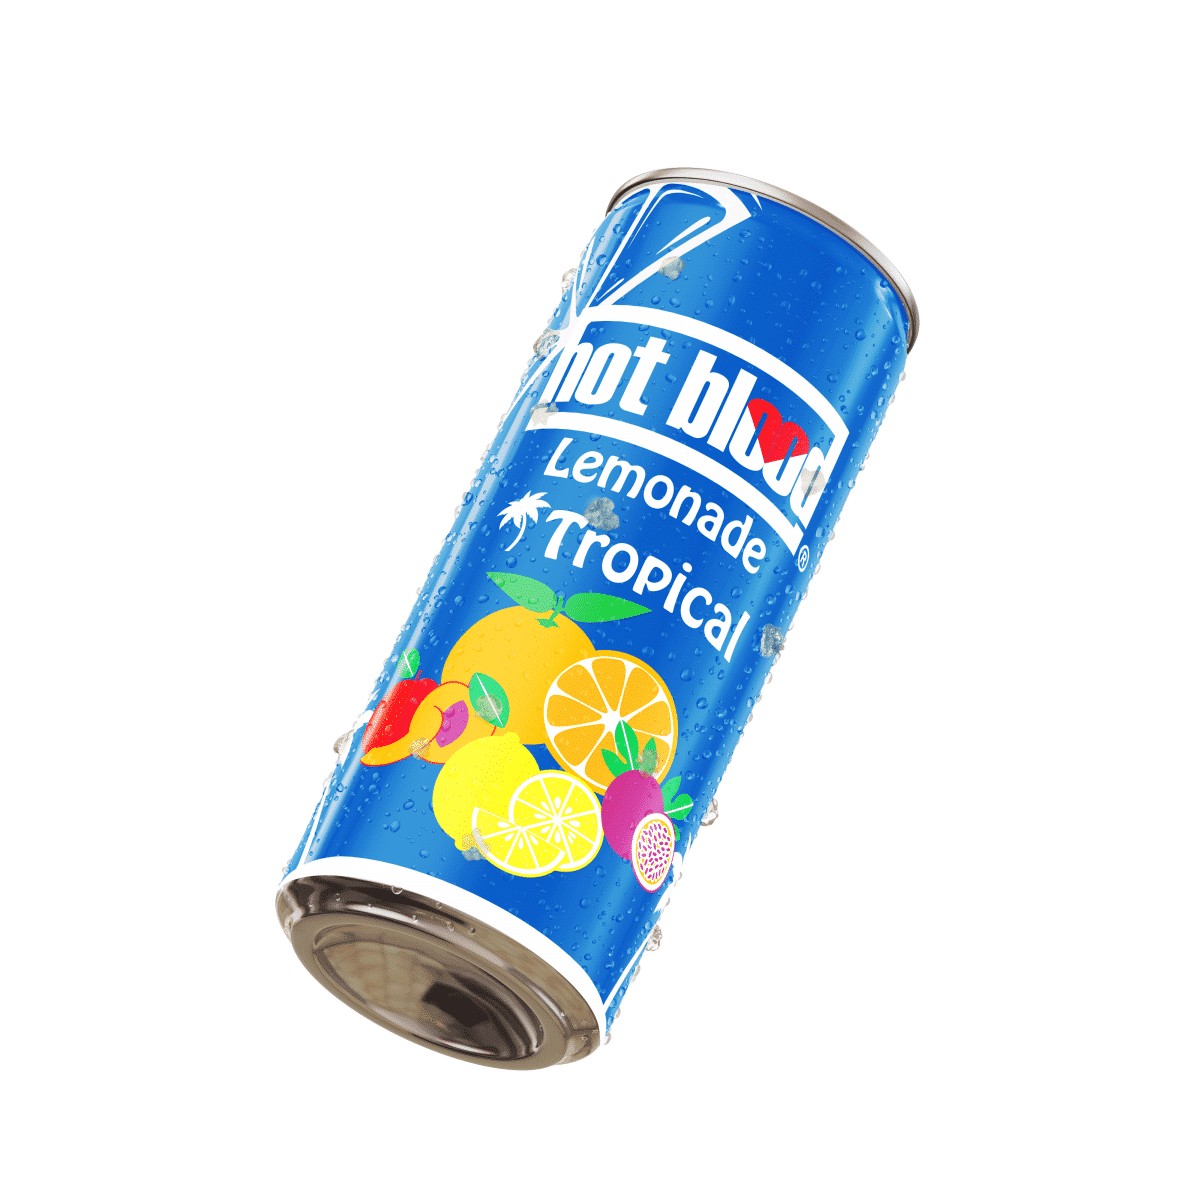 Hot Blood Lemonade Tropical 330ml